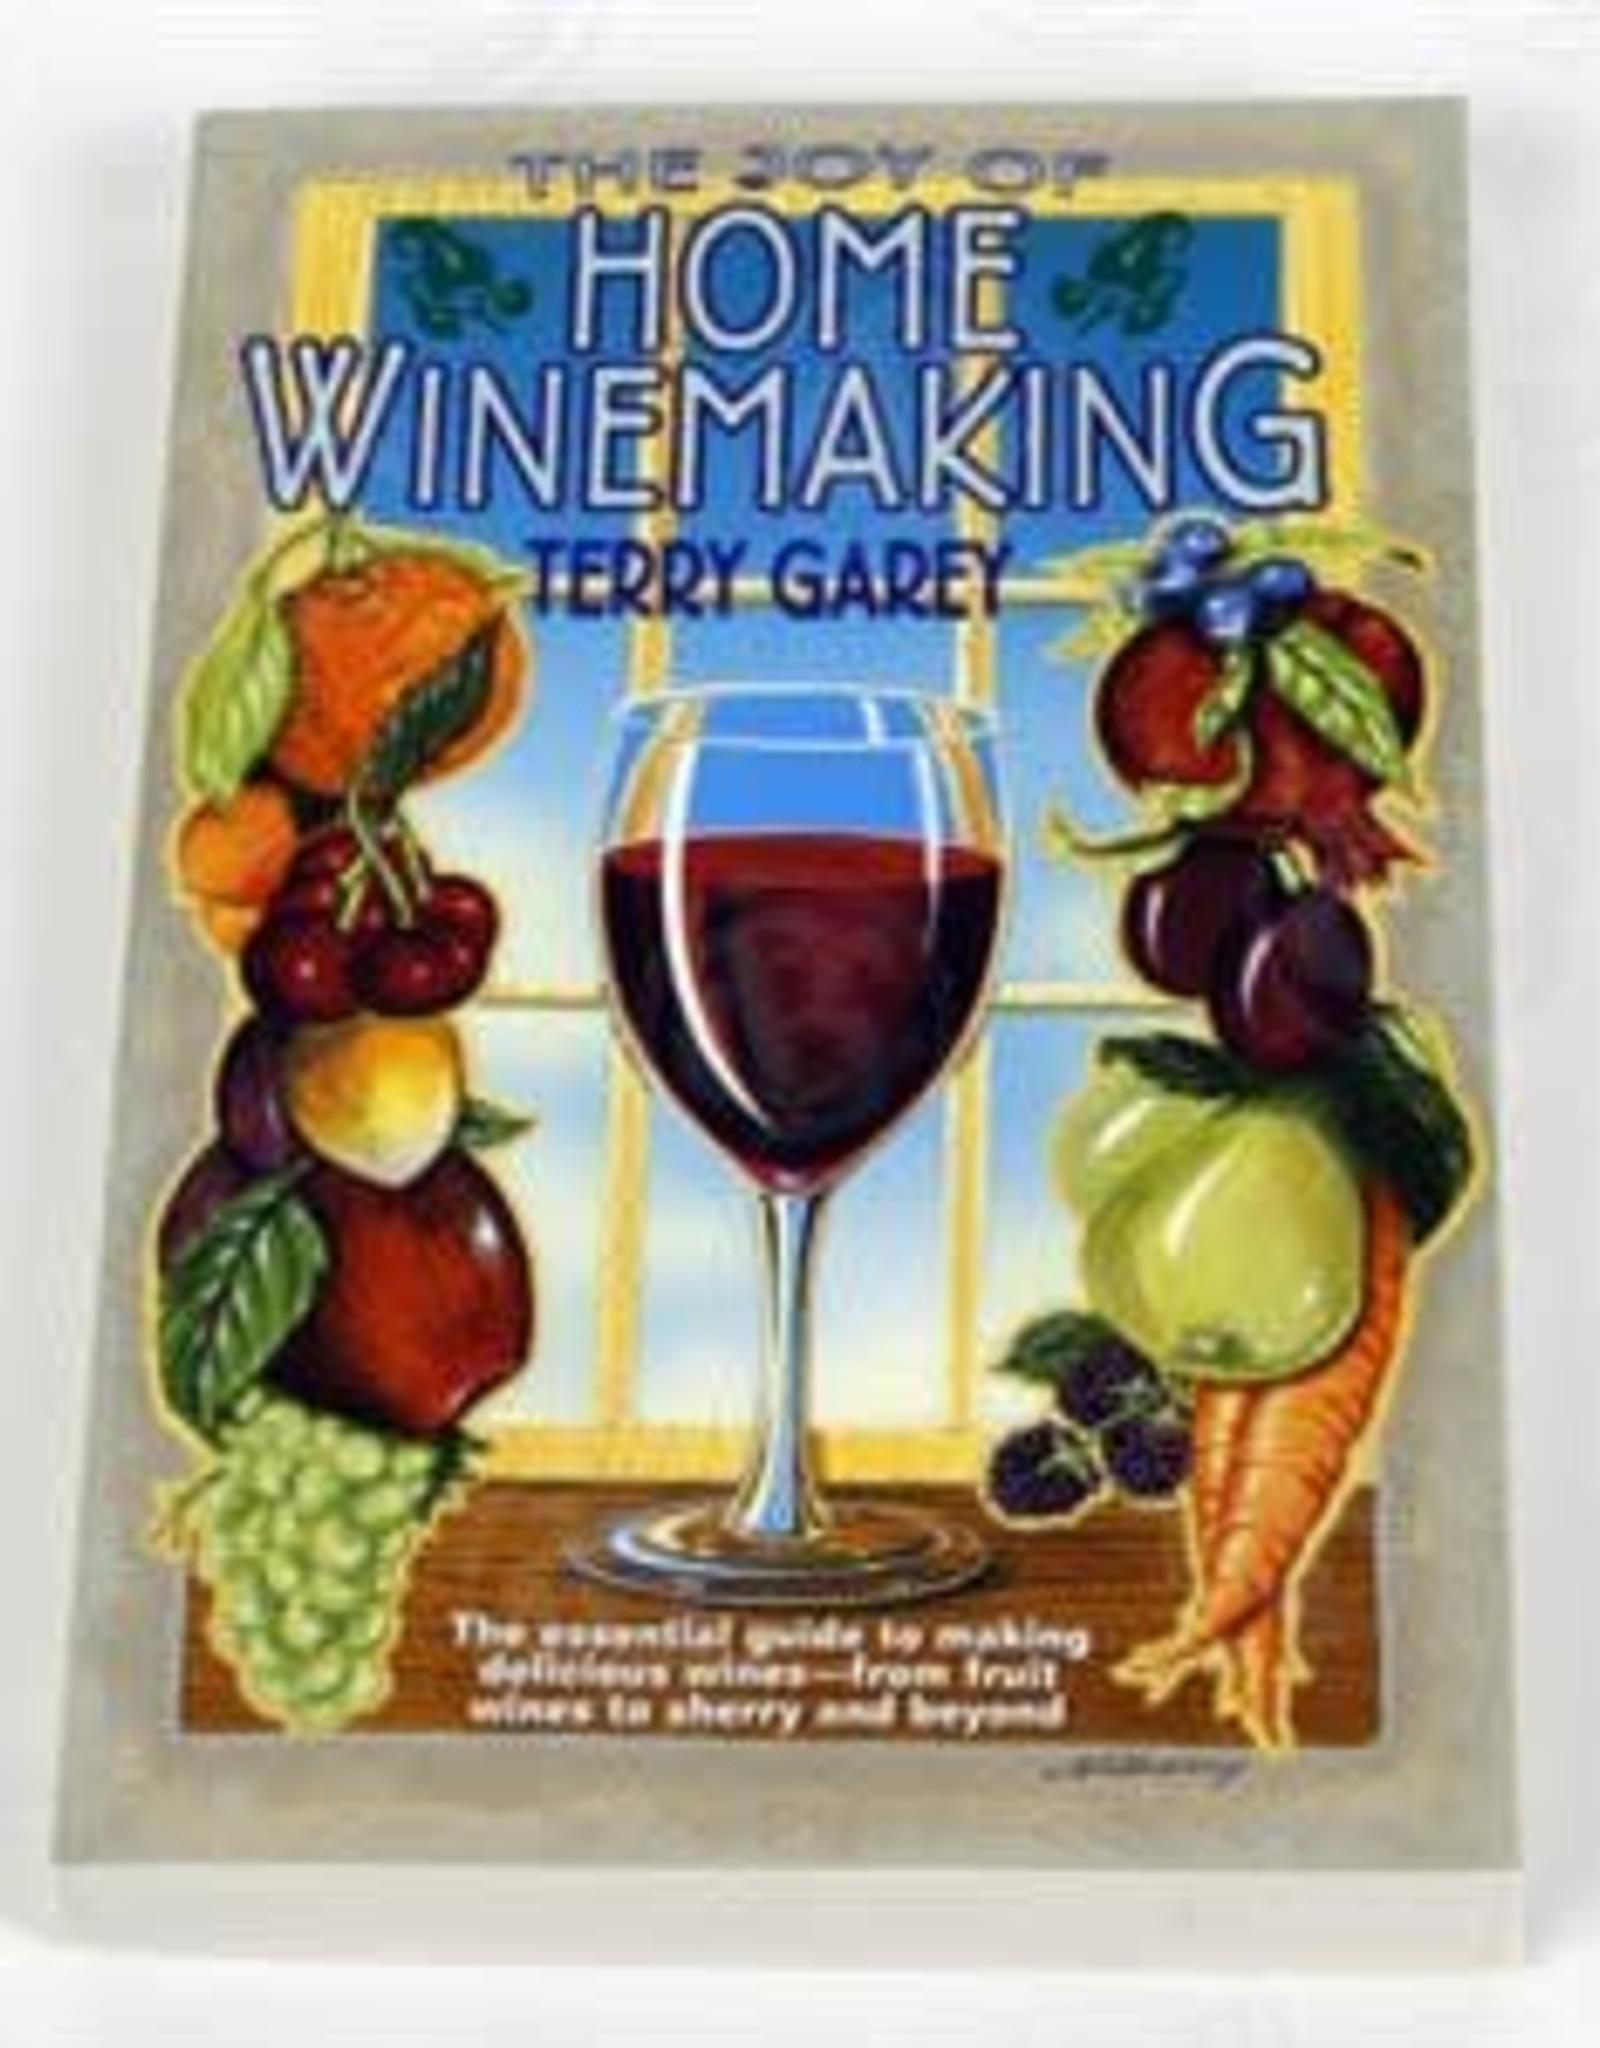 JOY OF HOME WINEMAKING